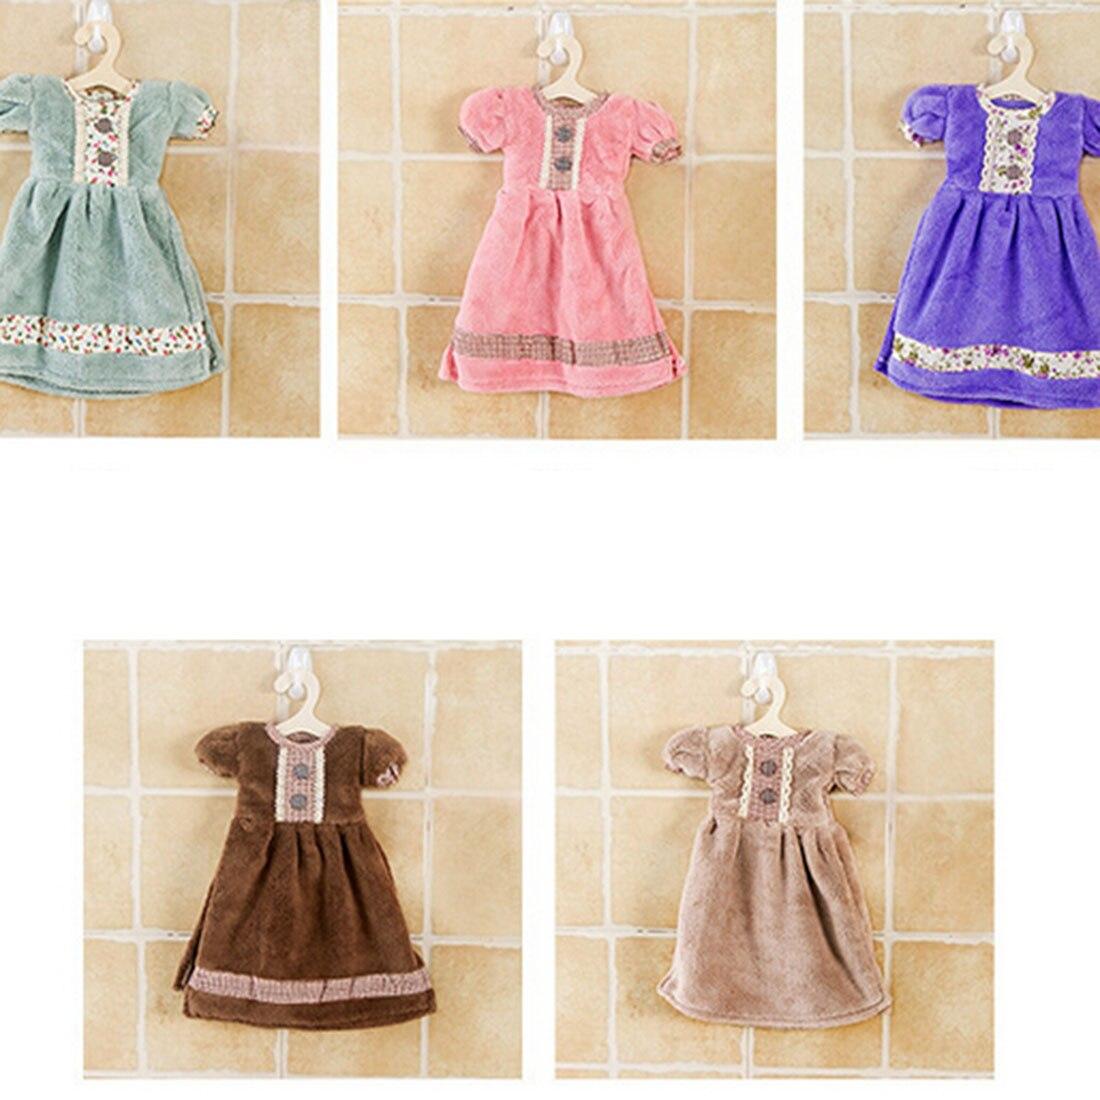 Fashion creative lovely princess skirt dress hand towel for Bathroom dress